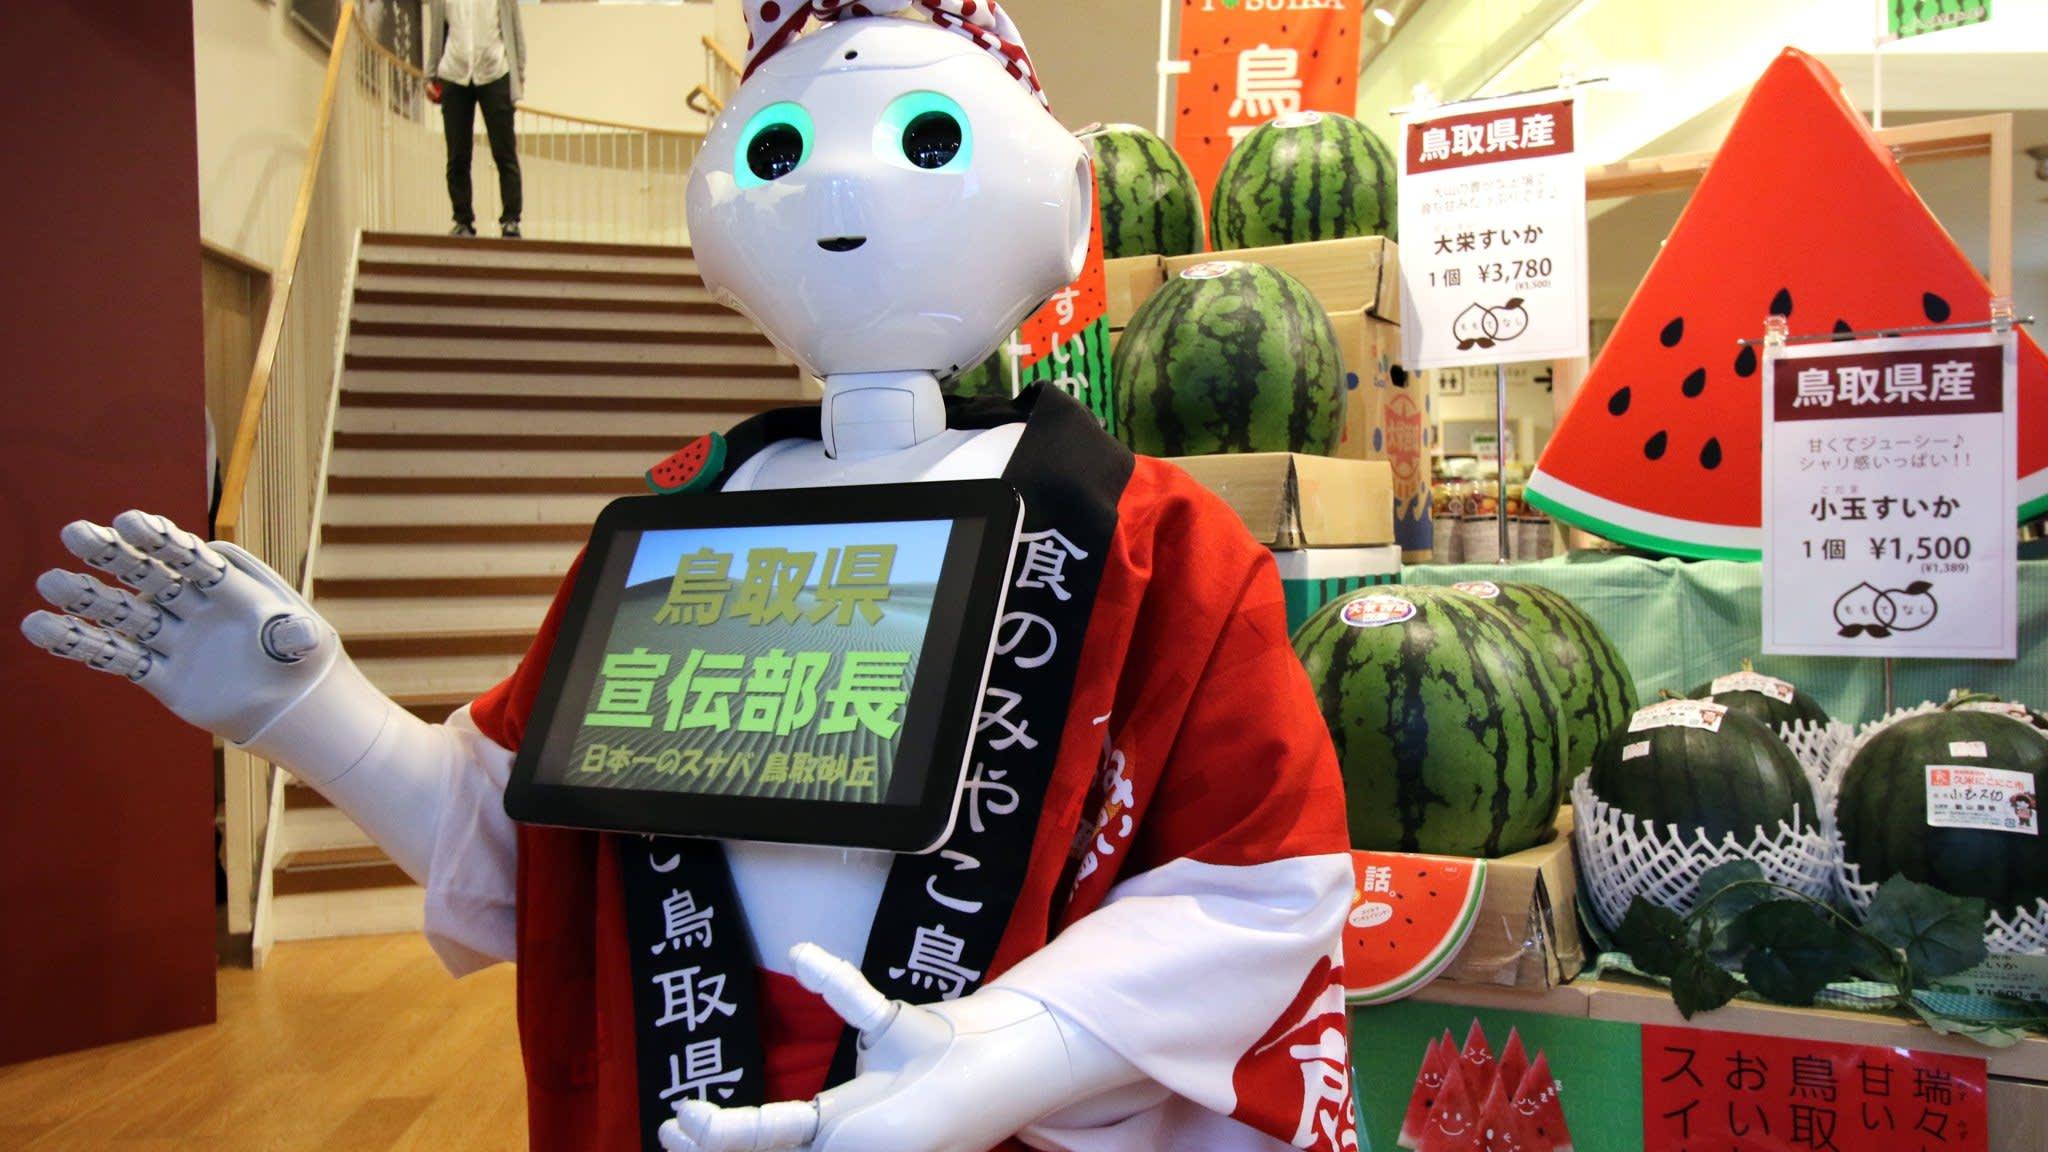 Investors should wake up to Japan's robotic future | Financial Times